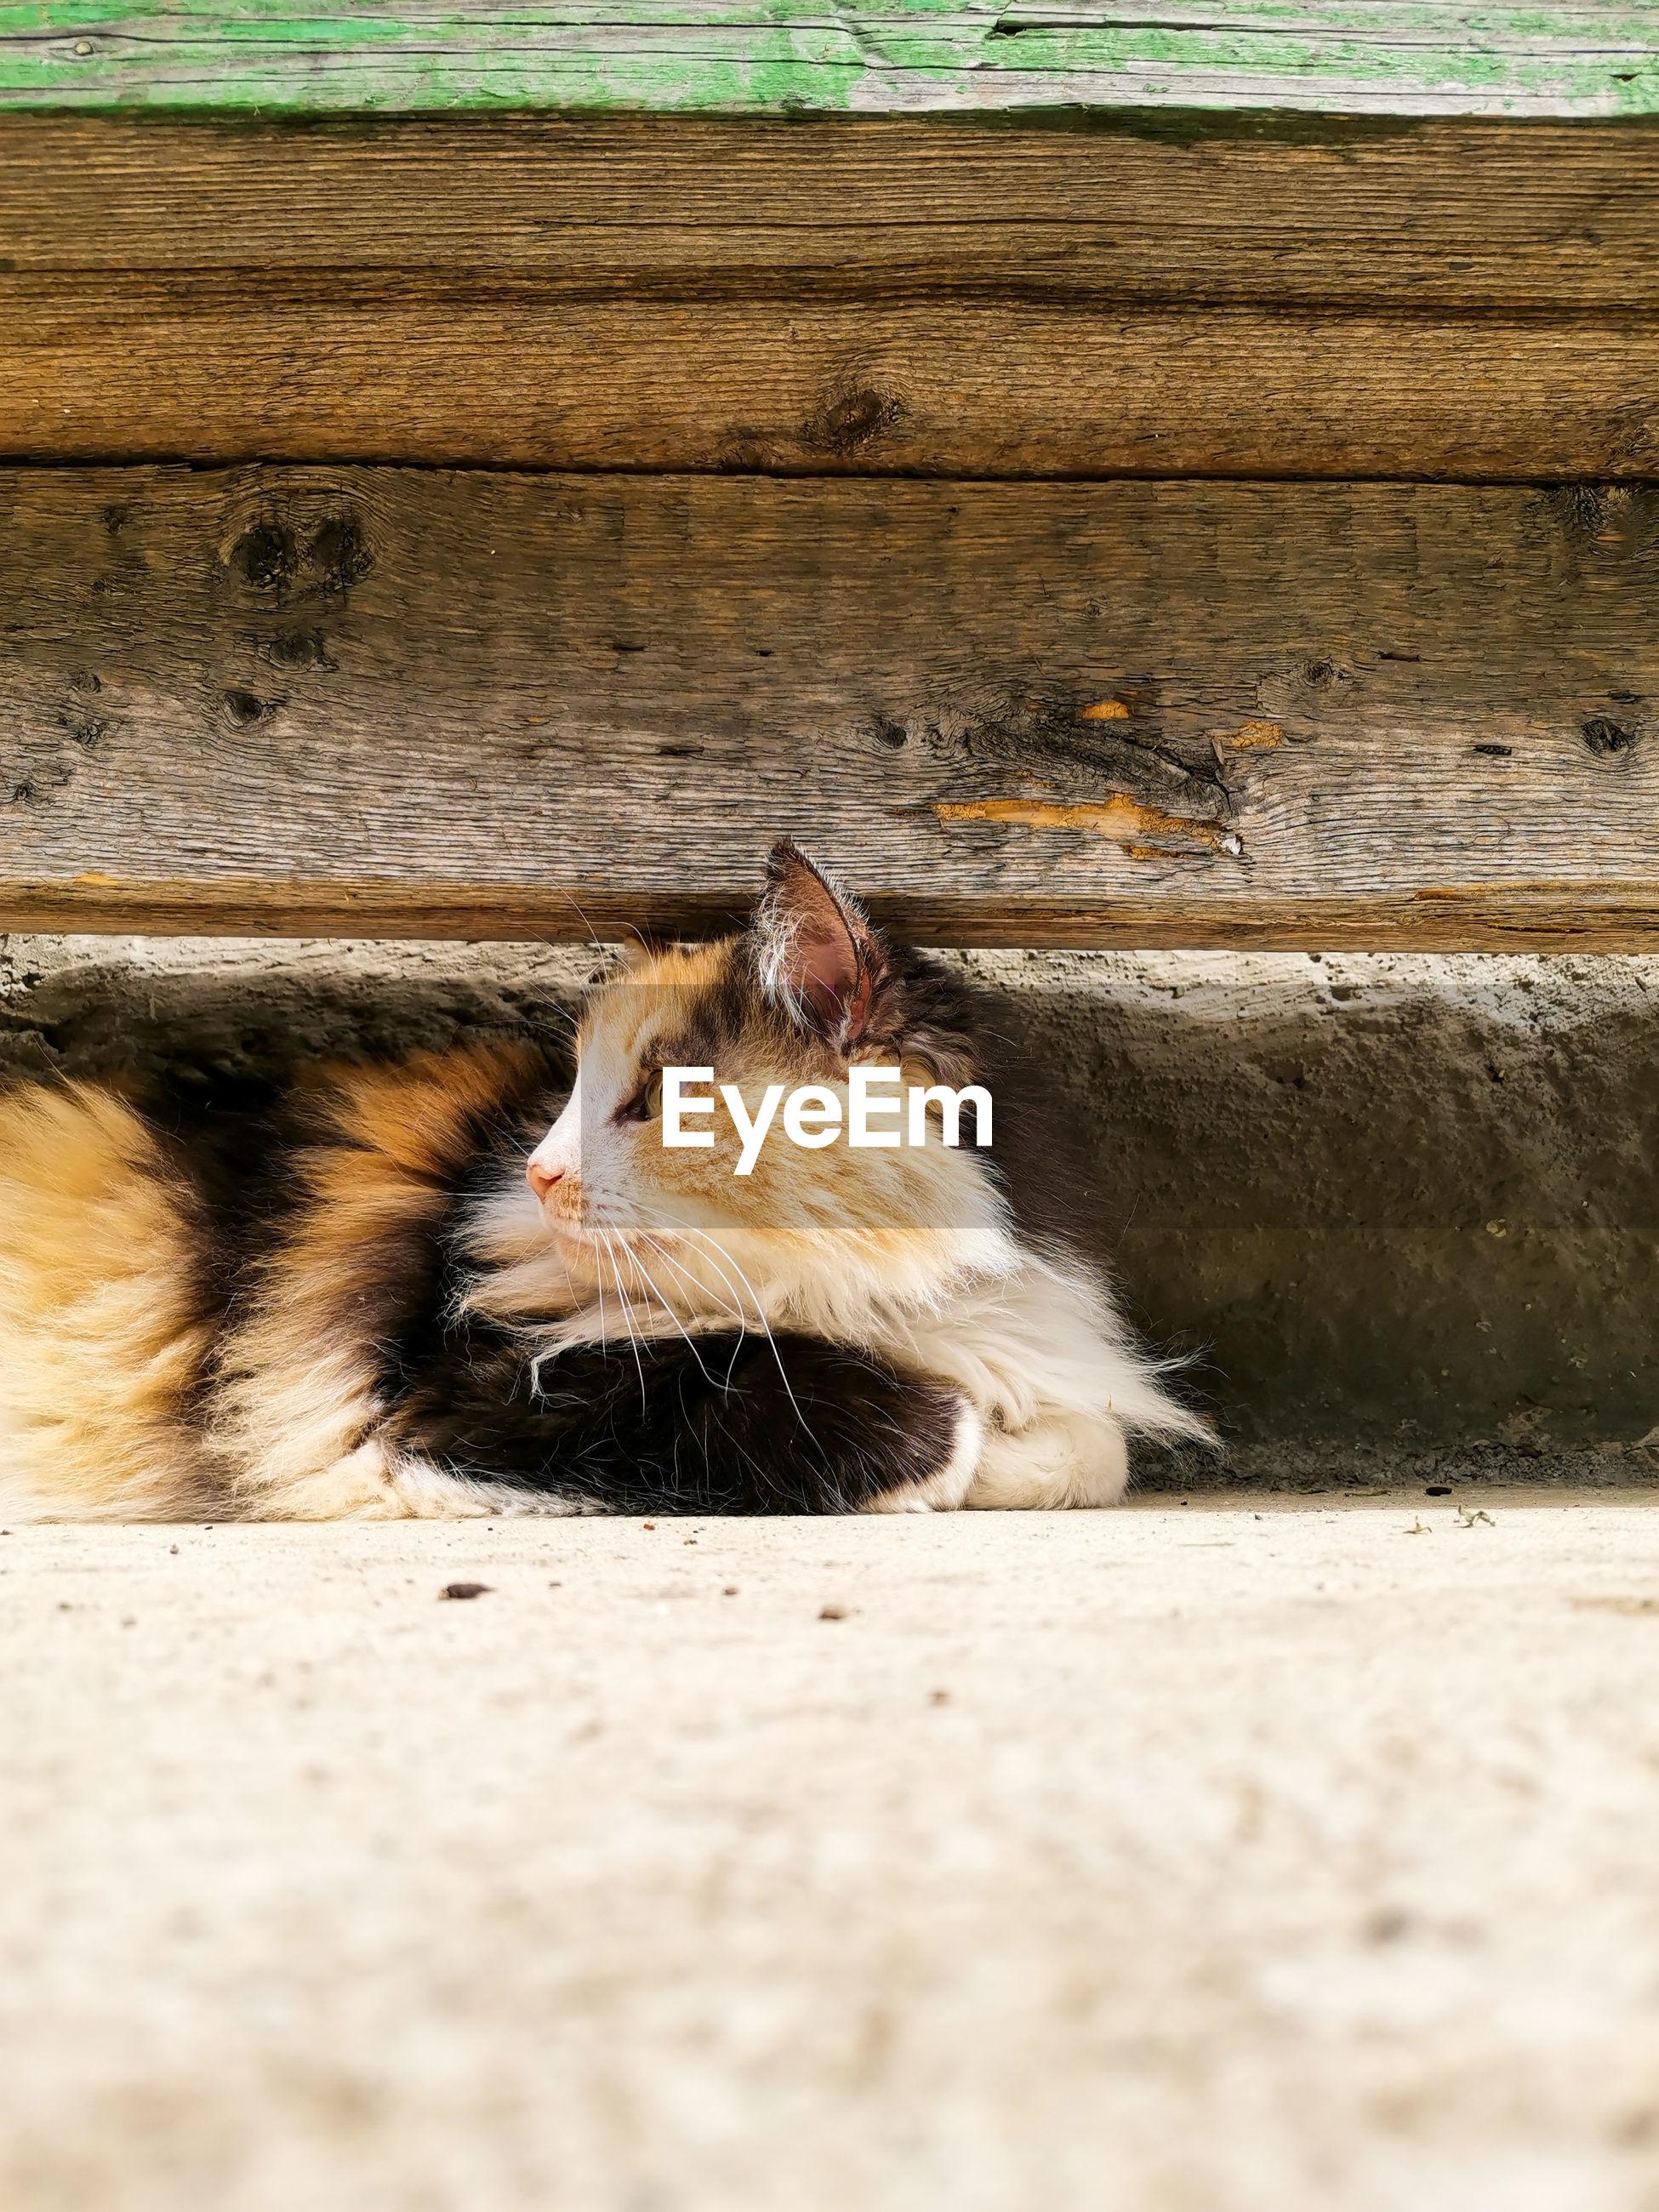 CAT RESTING IN A WOOD